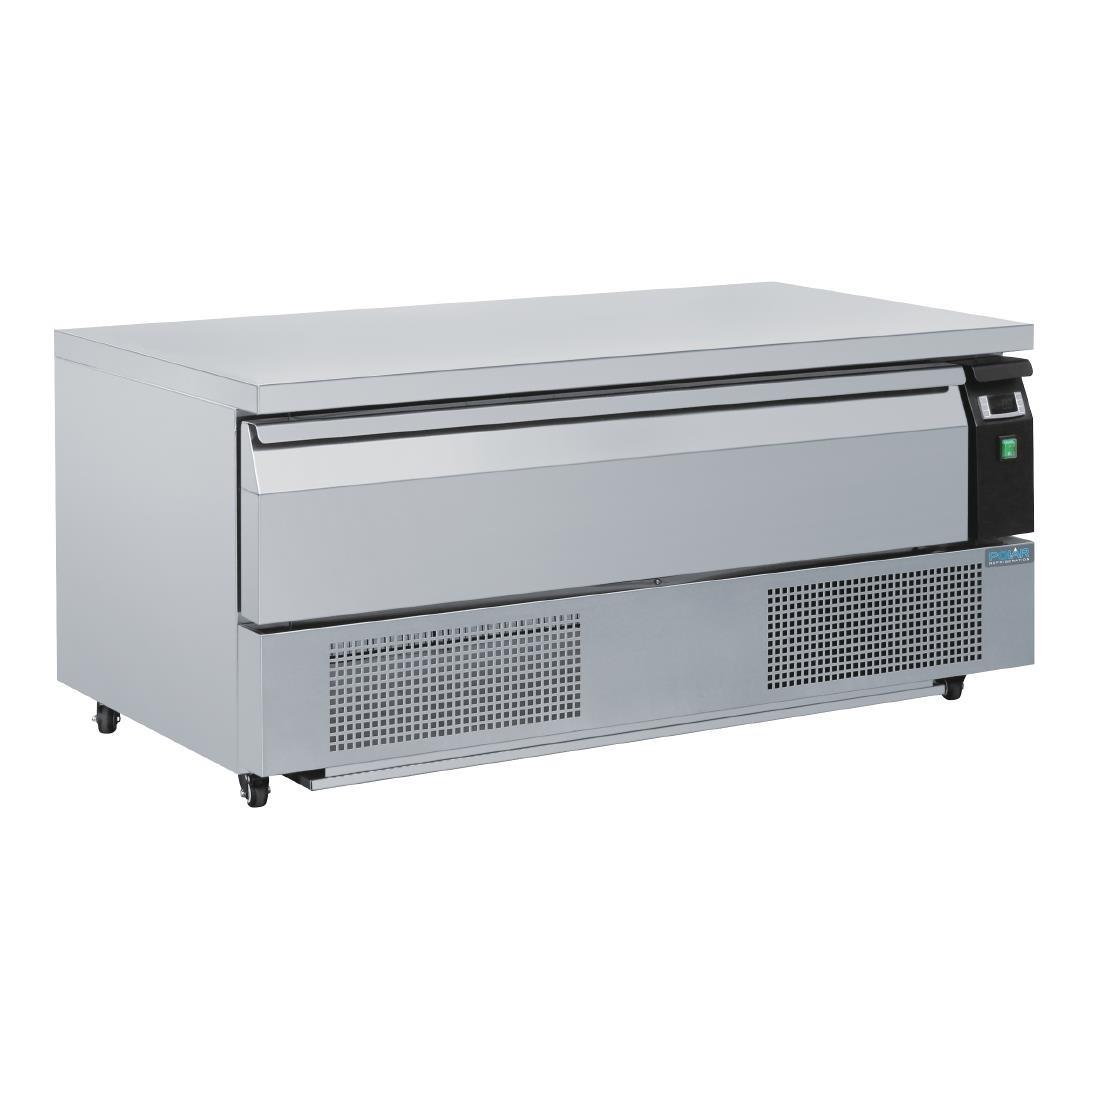 Polar DA995 U-Series Single Drawer Counter Fridge Freezer